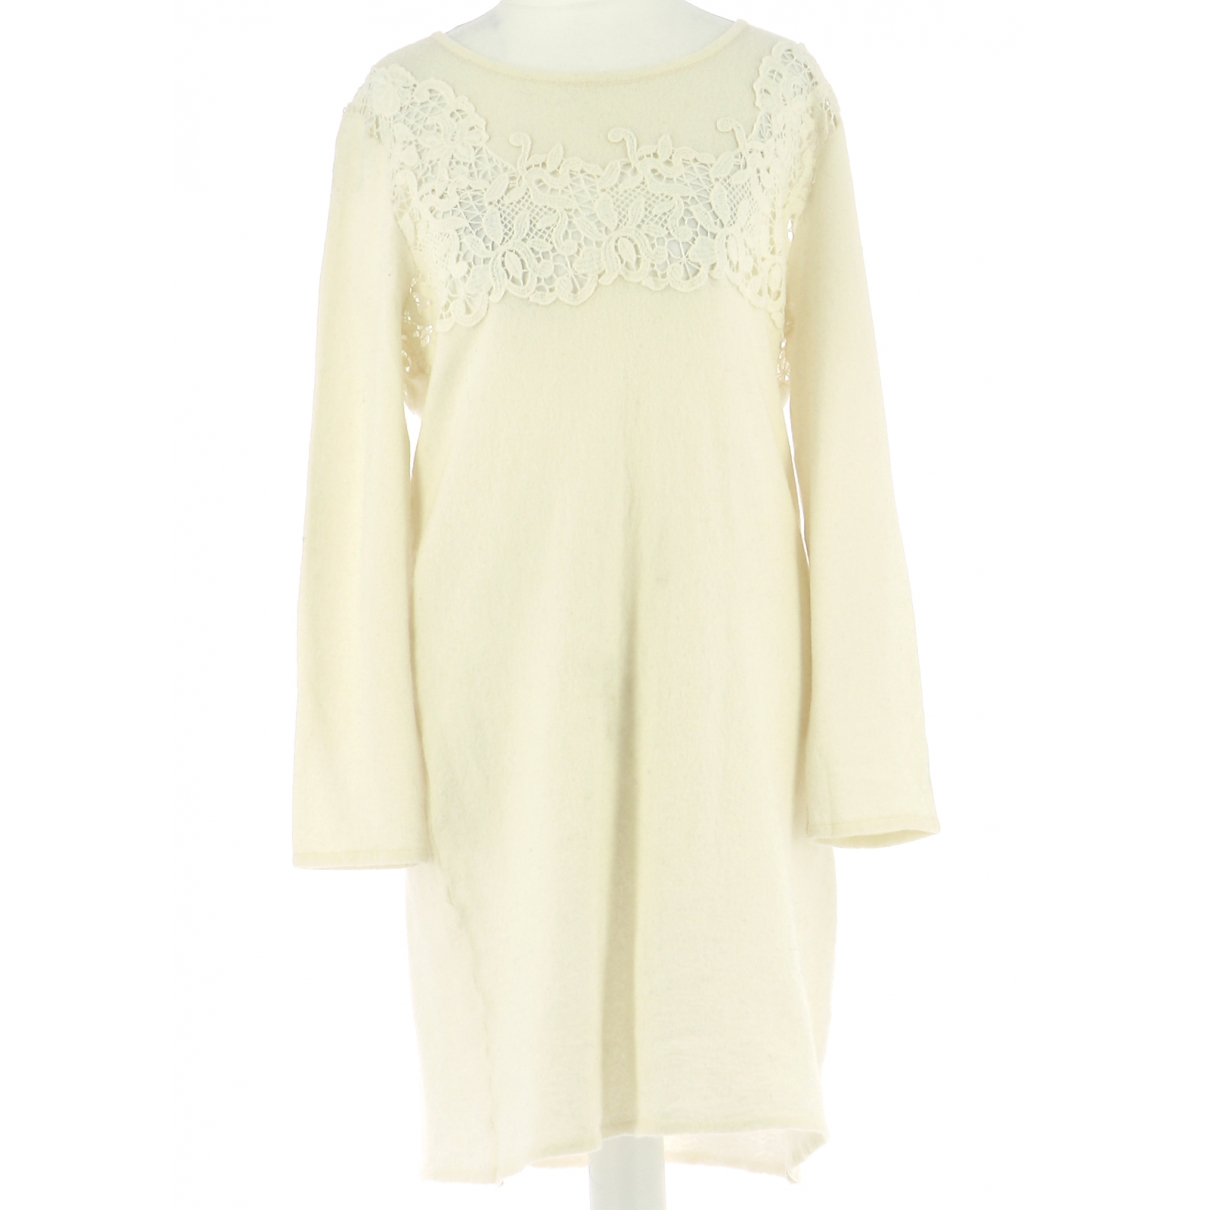 Ermanno Scervino N Wool dress for Women 42 FR